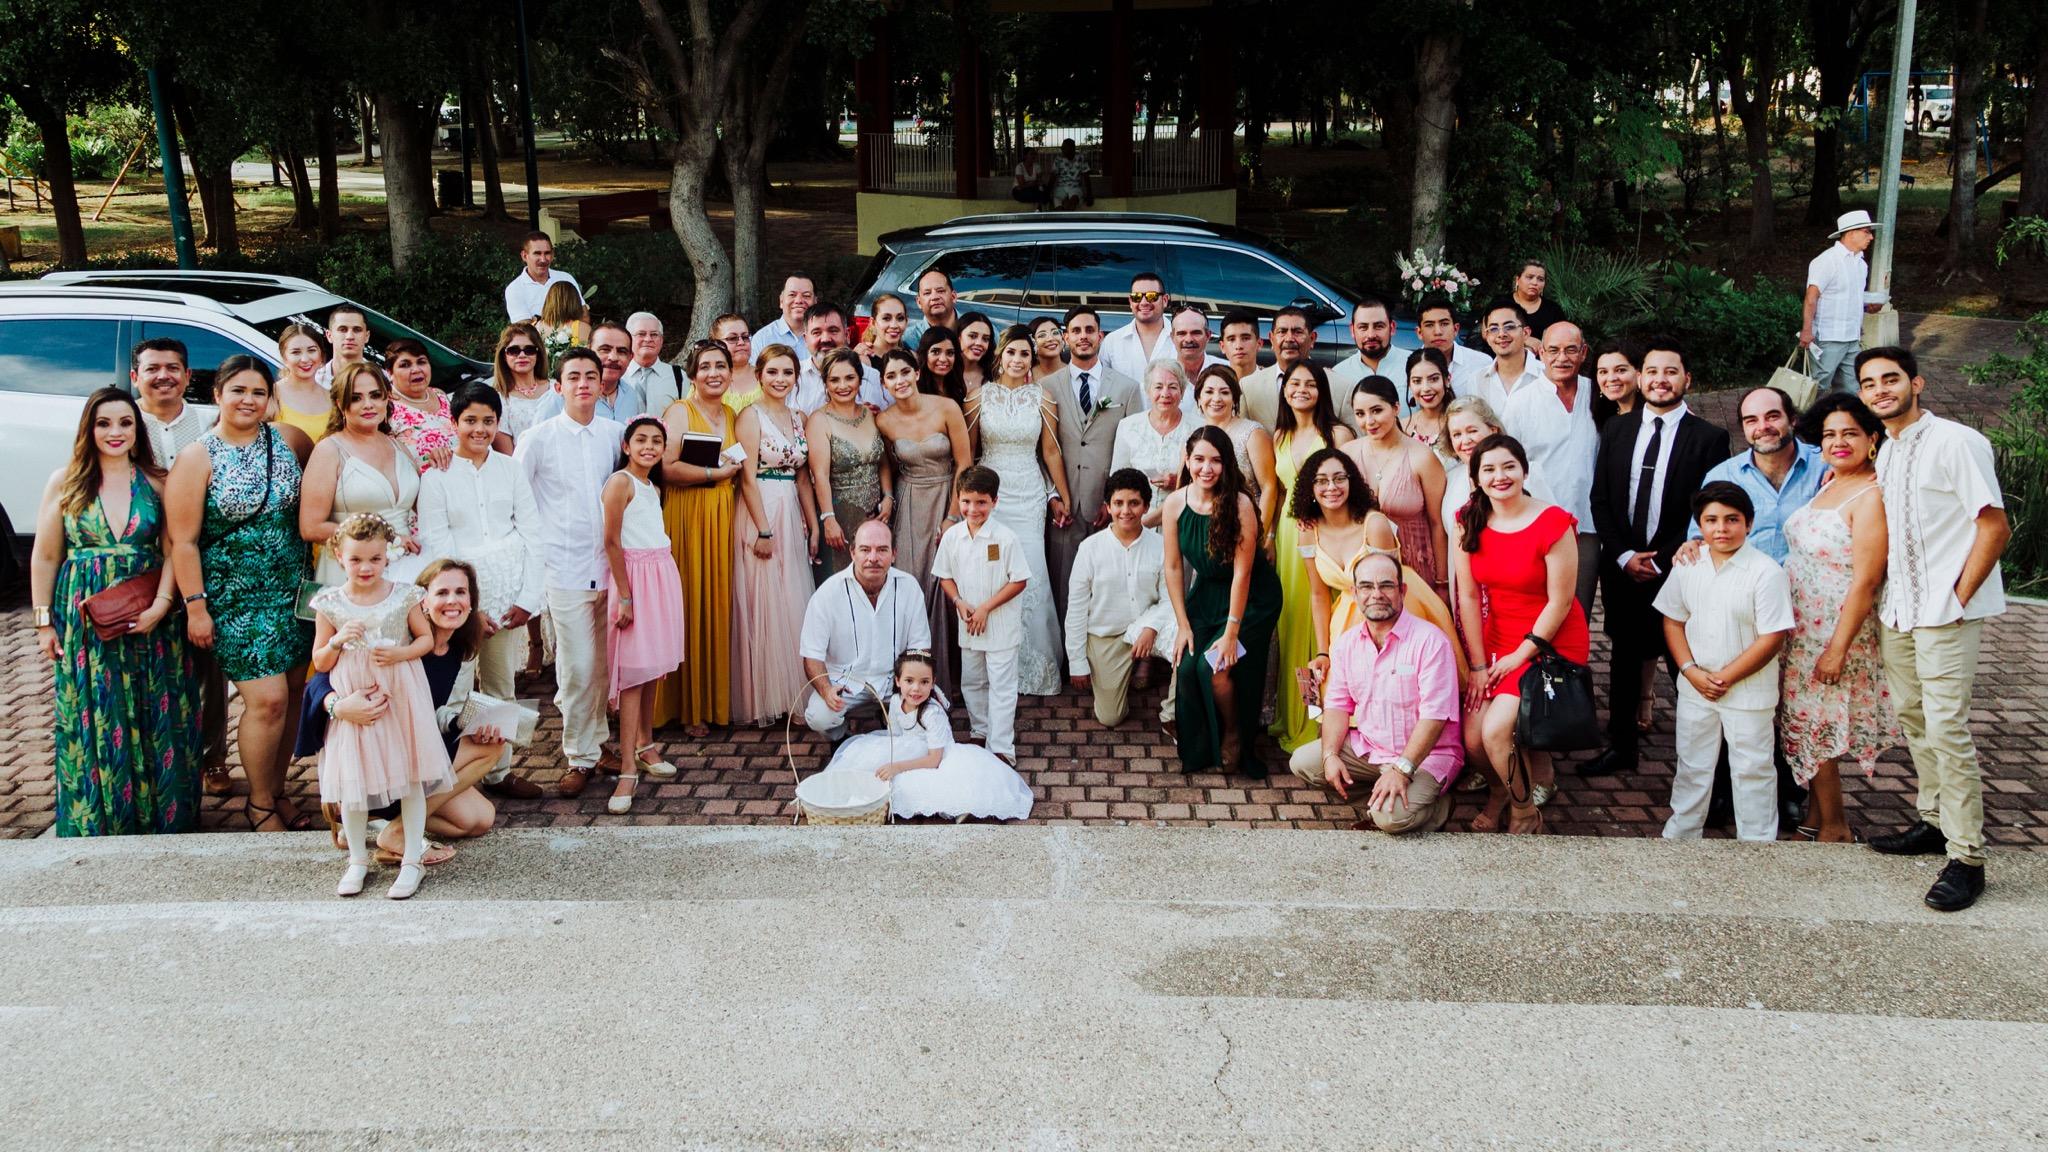 Javier_noriega_fotografo_bodas_profesional_zacatecas_mexico_mazatlan_sinaloa_photographer_weddings39